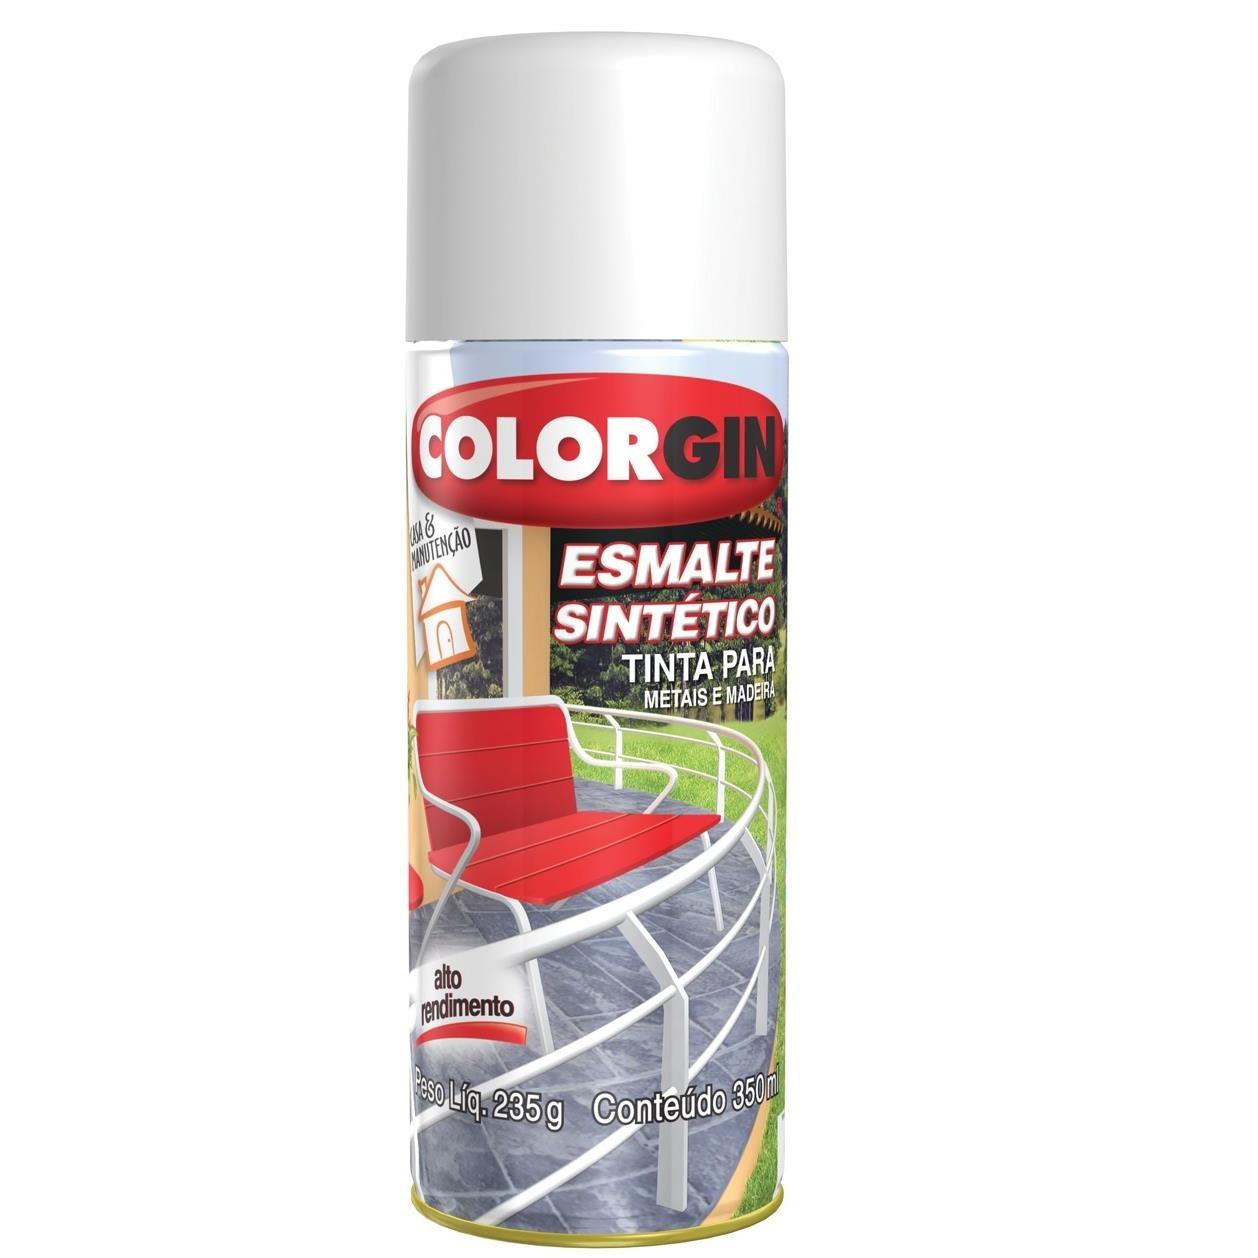 Tinta Spray Brilhante Esmalte sintetico Interno e Externo - Azul Colonial - 350ml - Colorgin